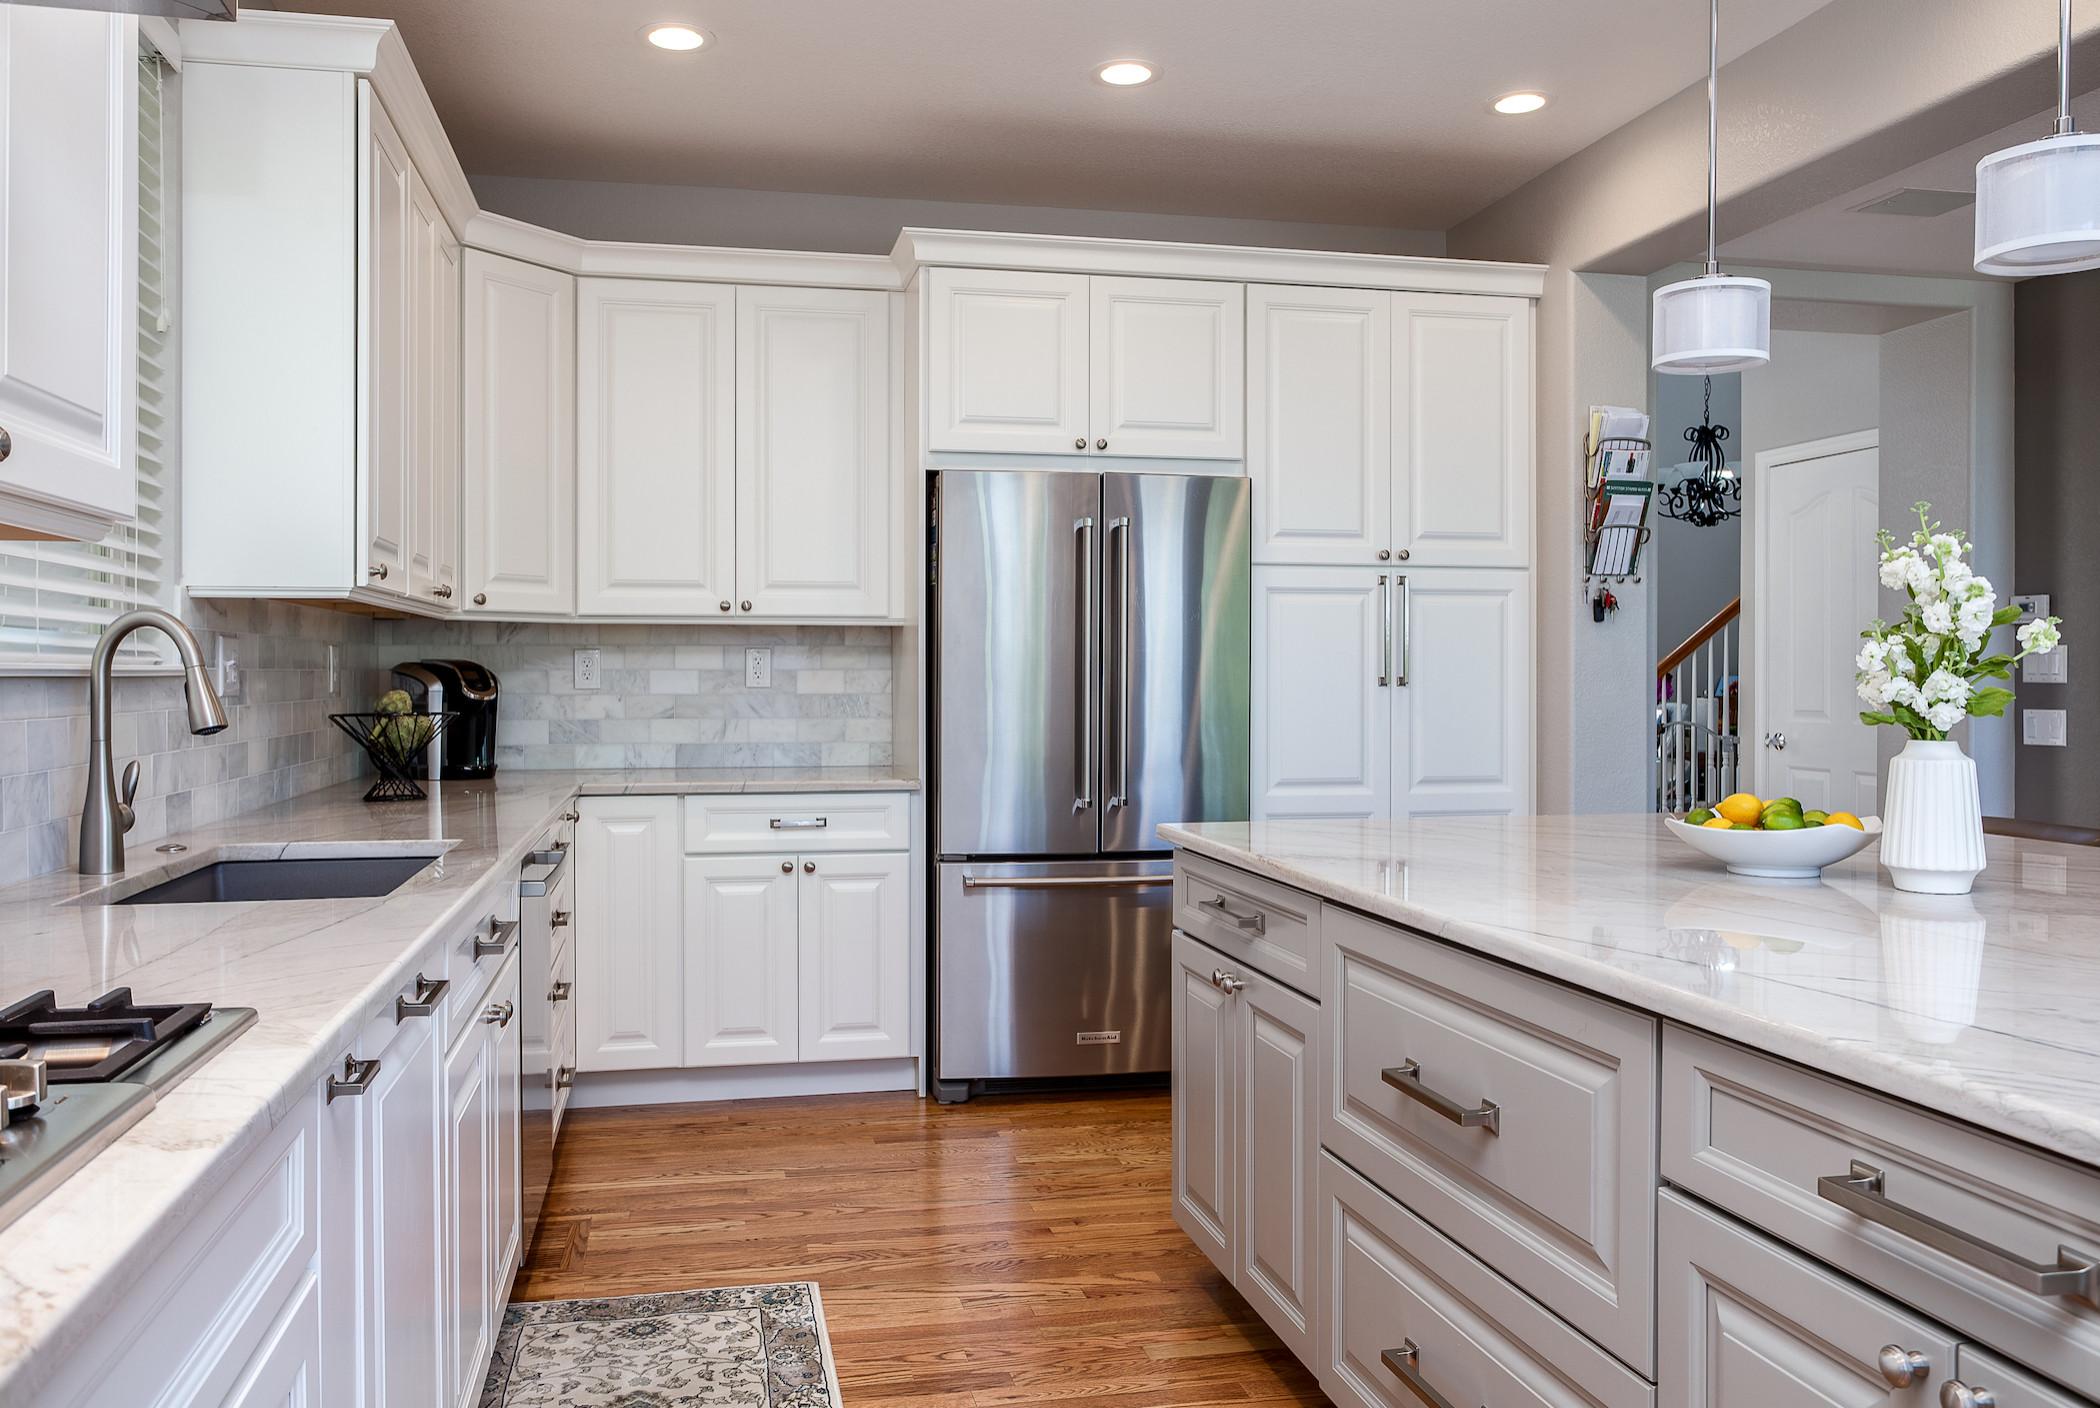 McArthur Ranch Kitchen Remodel